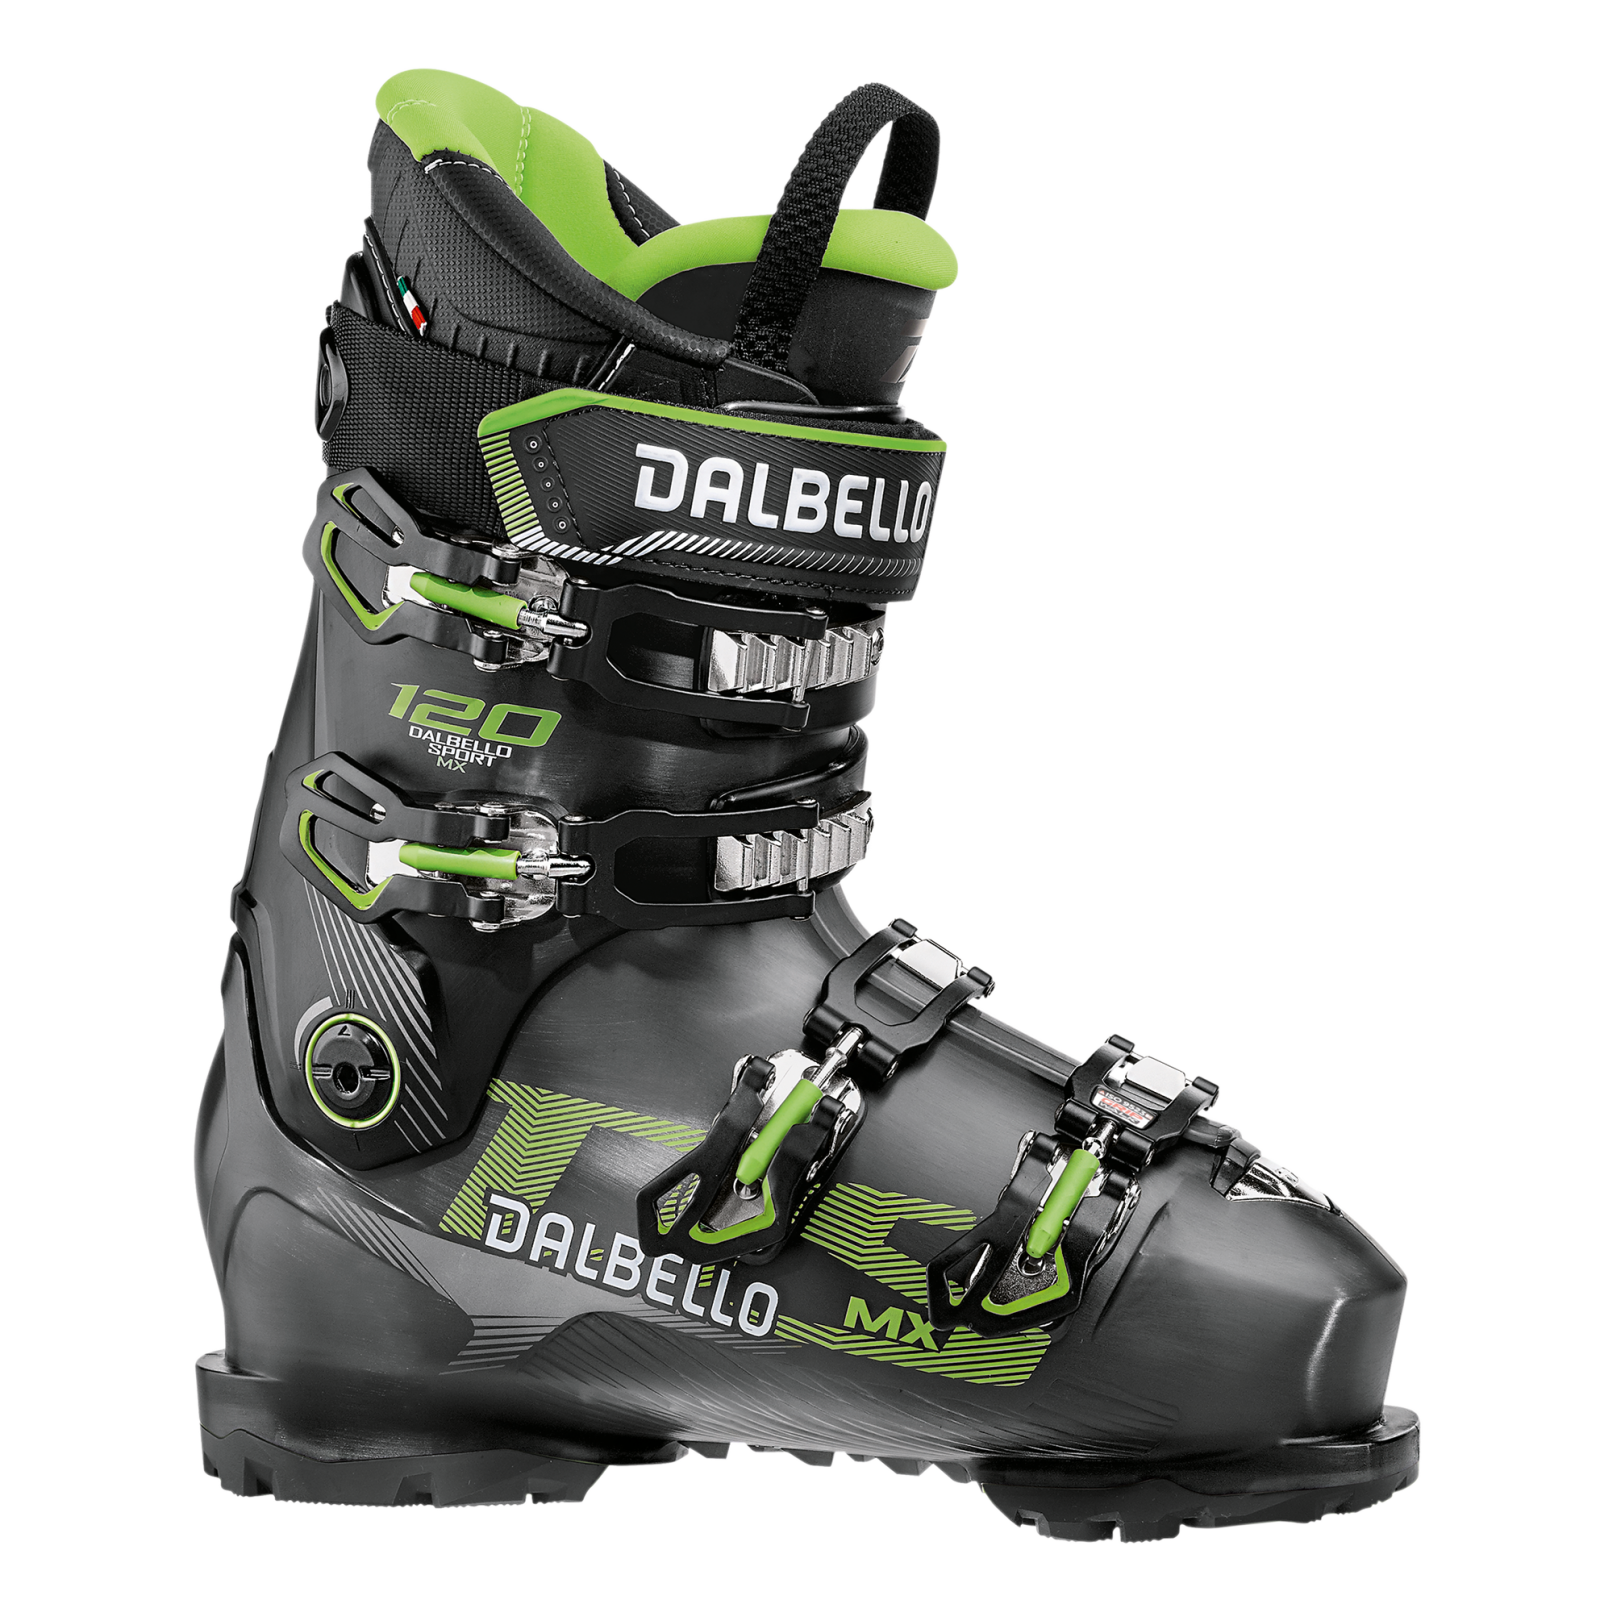 Dalbello DS MX 120 Ski Boot